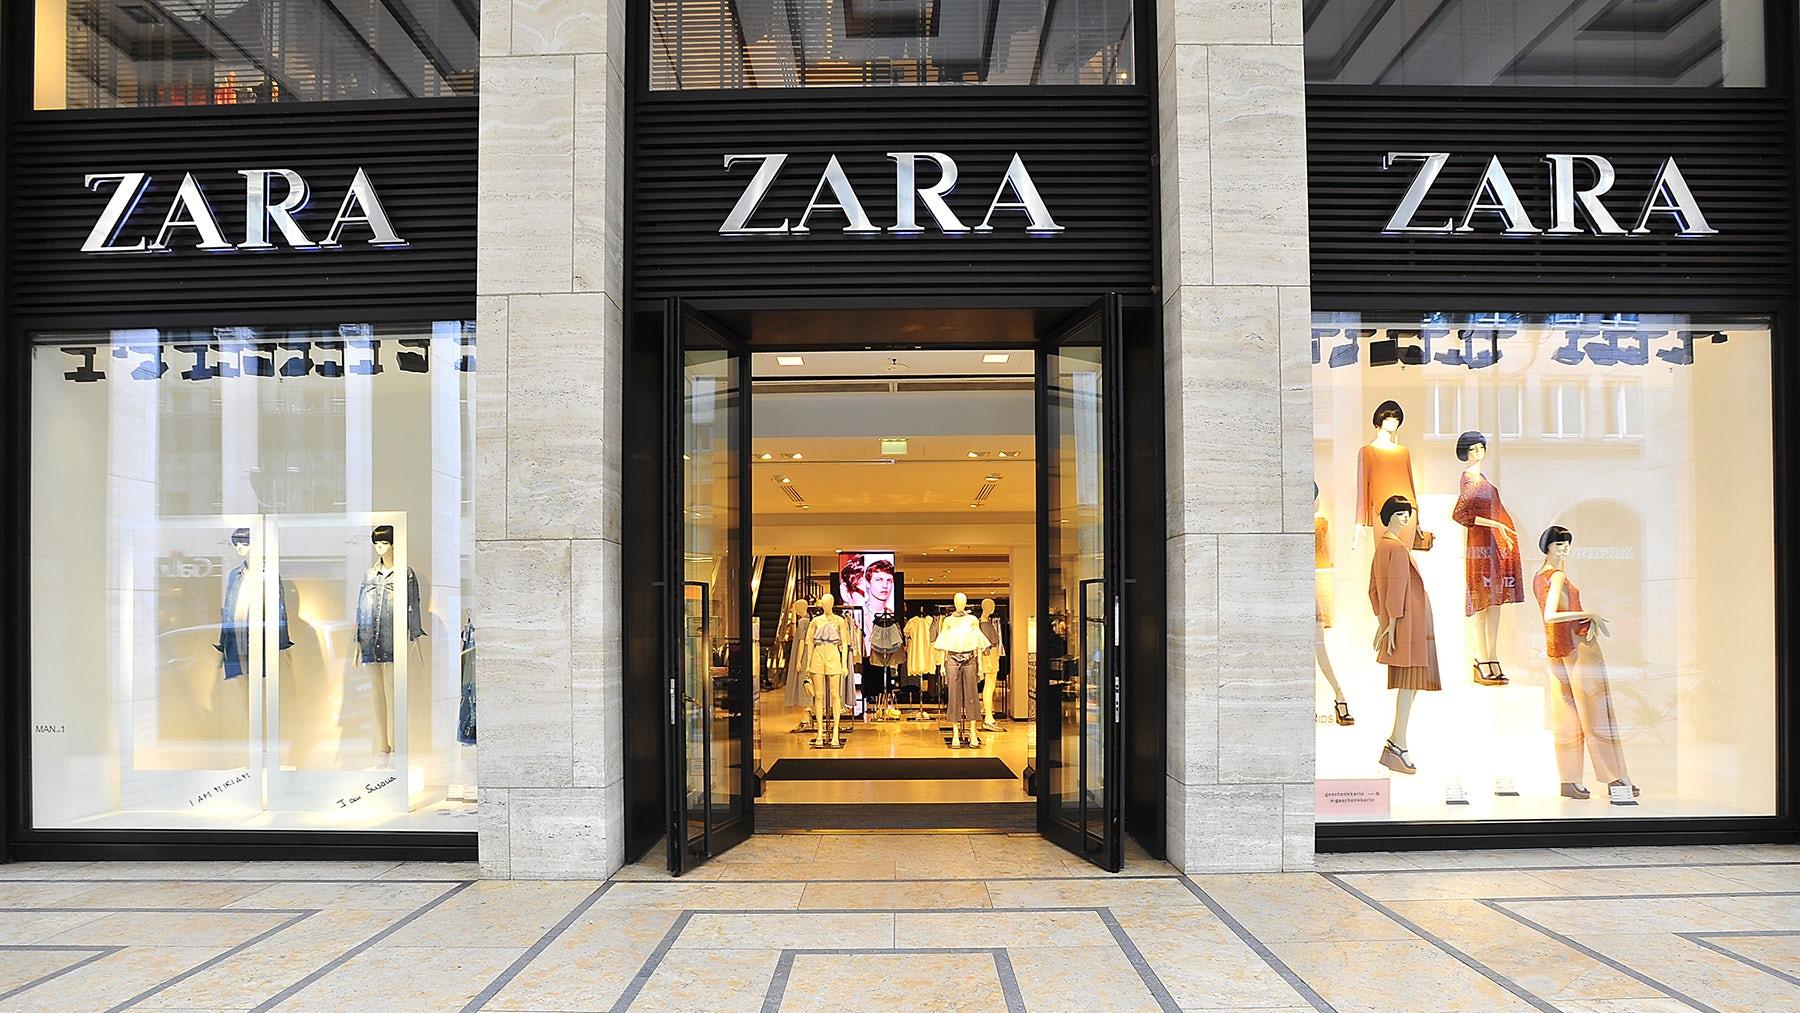 Zara store | Source: Shutterstock